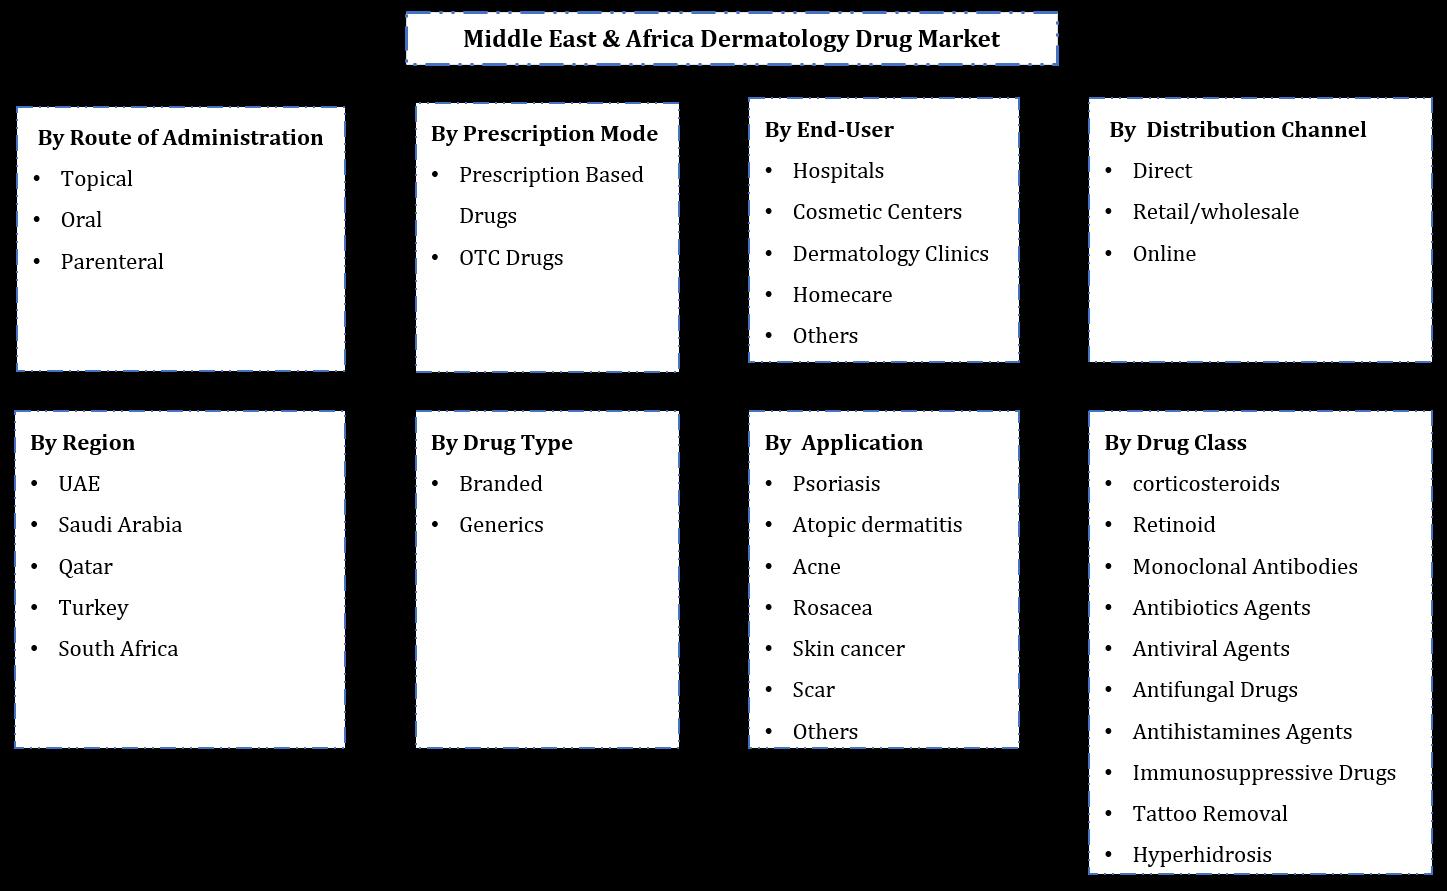 Middle East & Africa Dermatology Drugs Market Segmentation